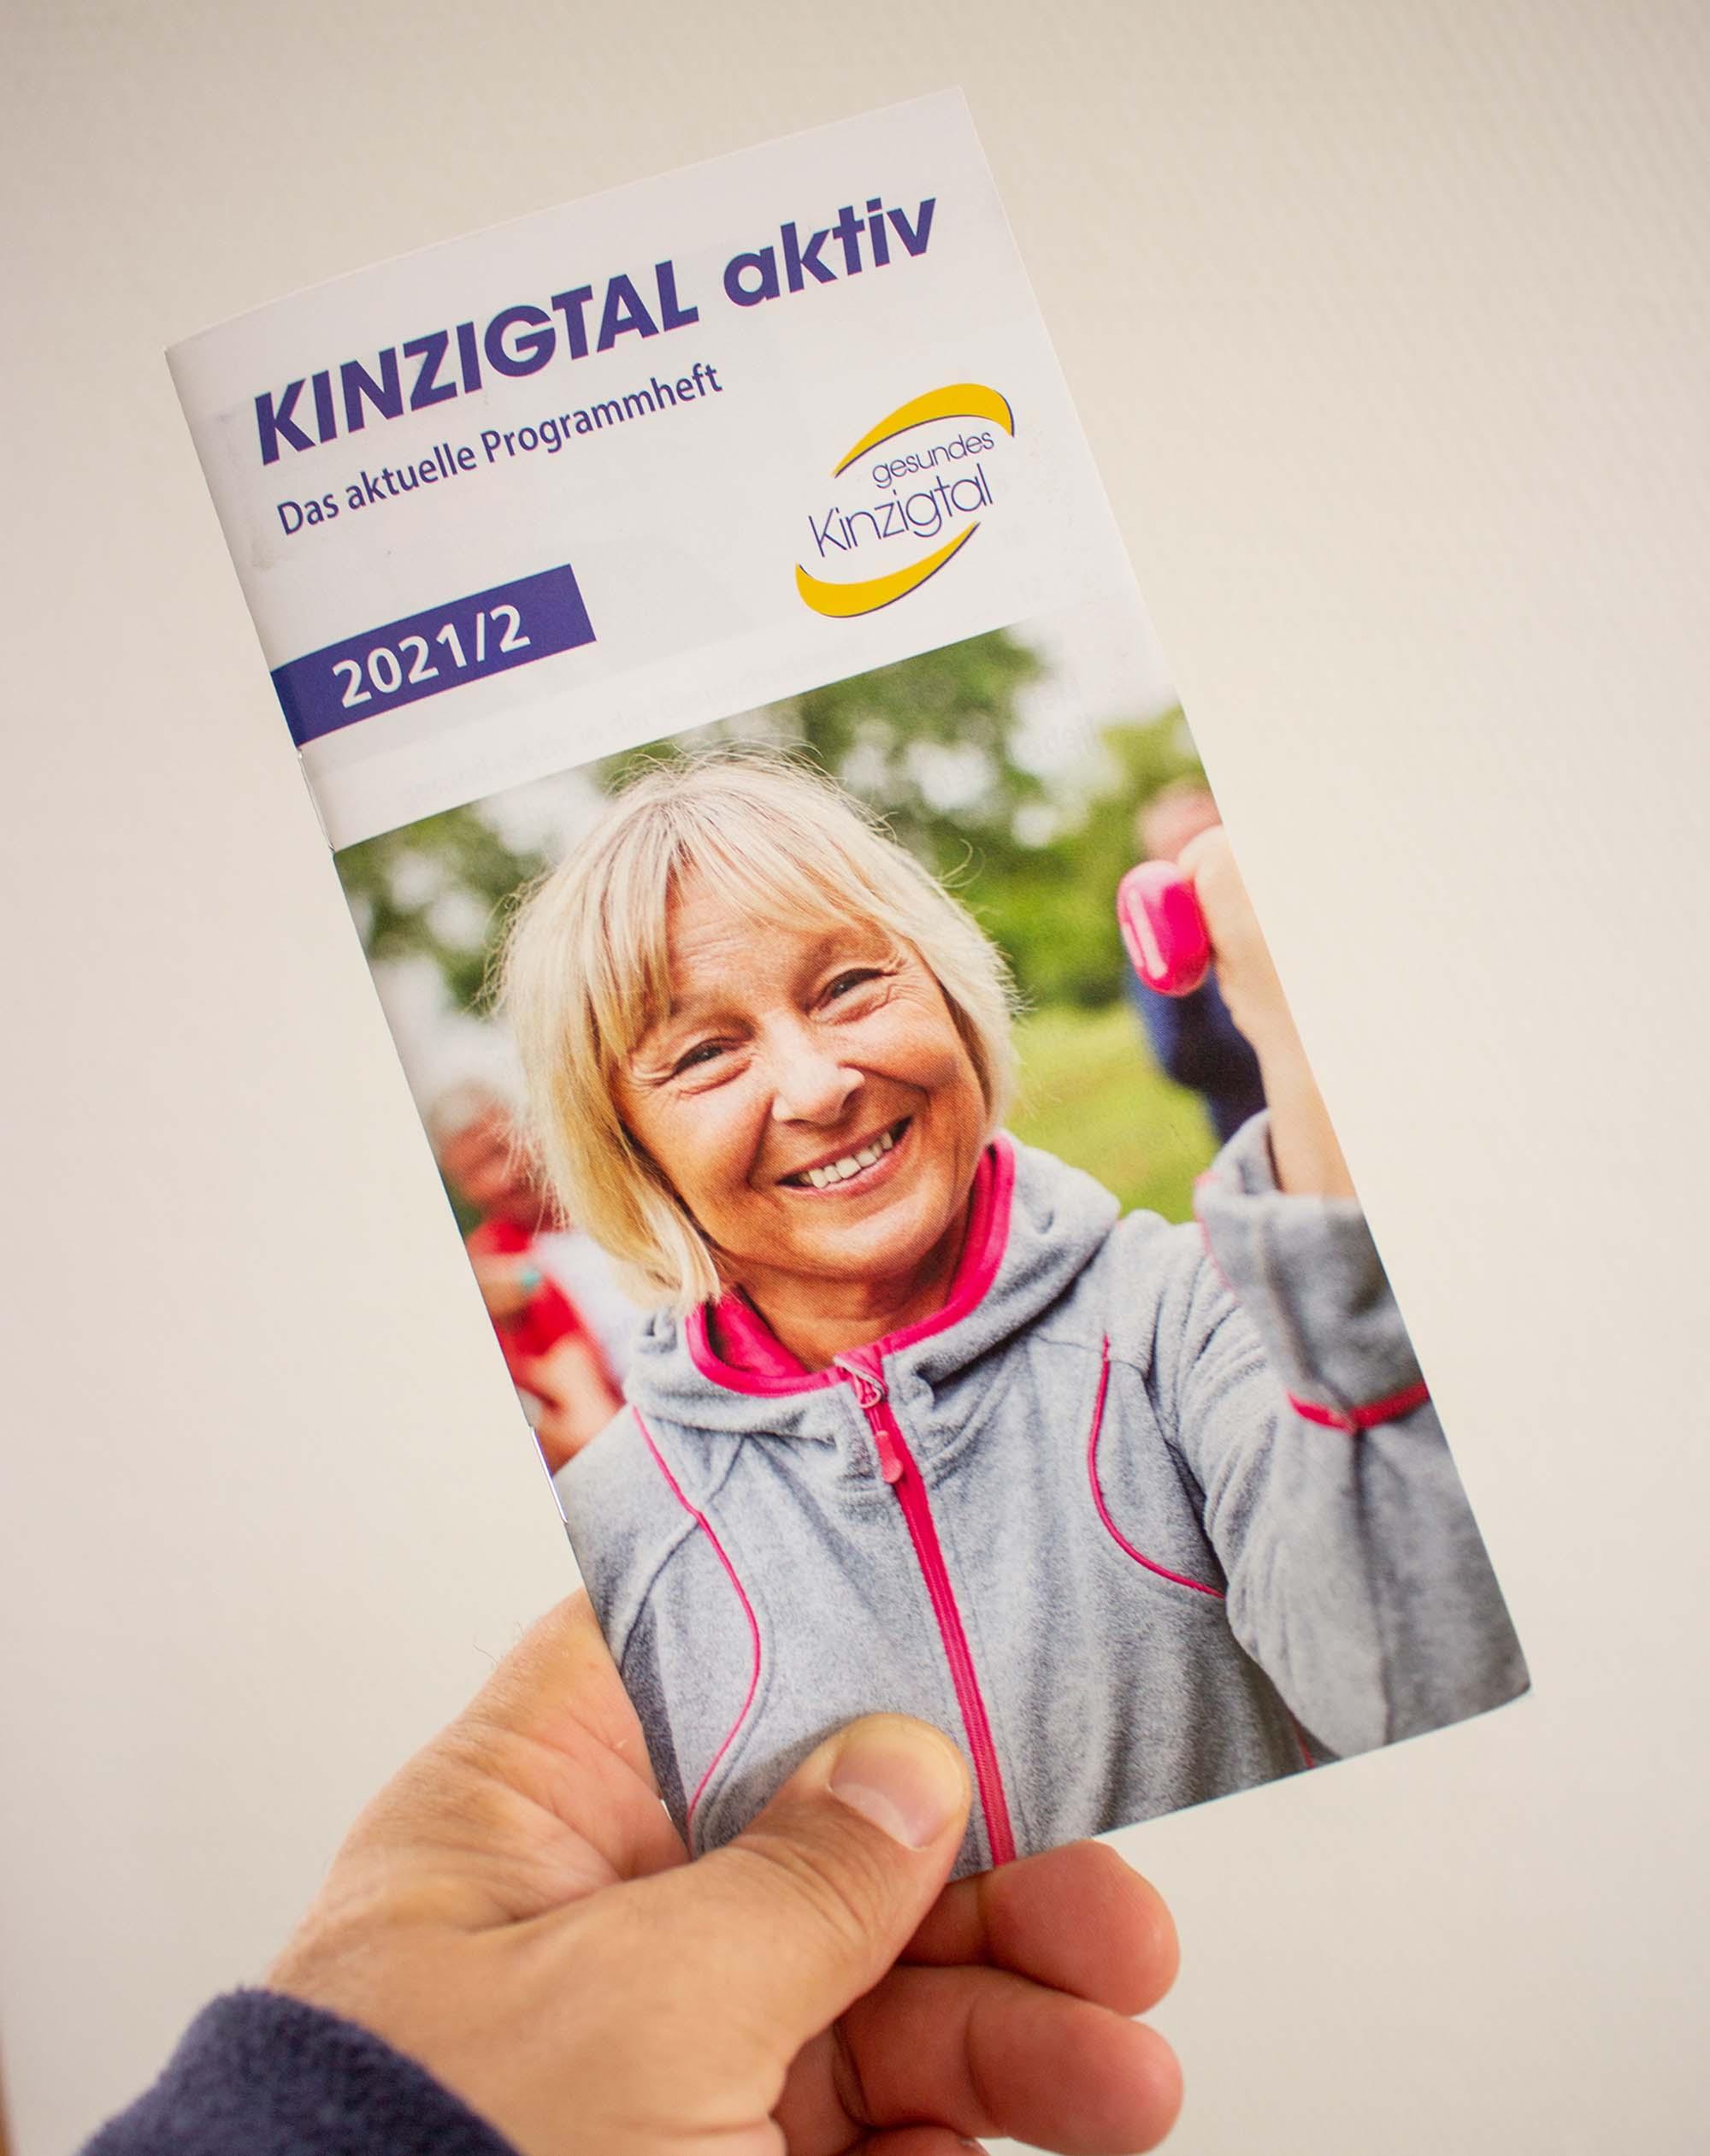 2021-8-27-HS- Gesundes Kinzigtal- Pressemitteilung_Programm-2021-2_cover